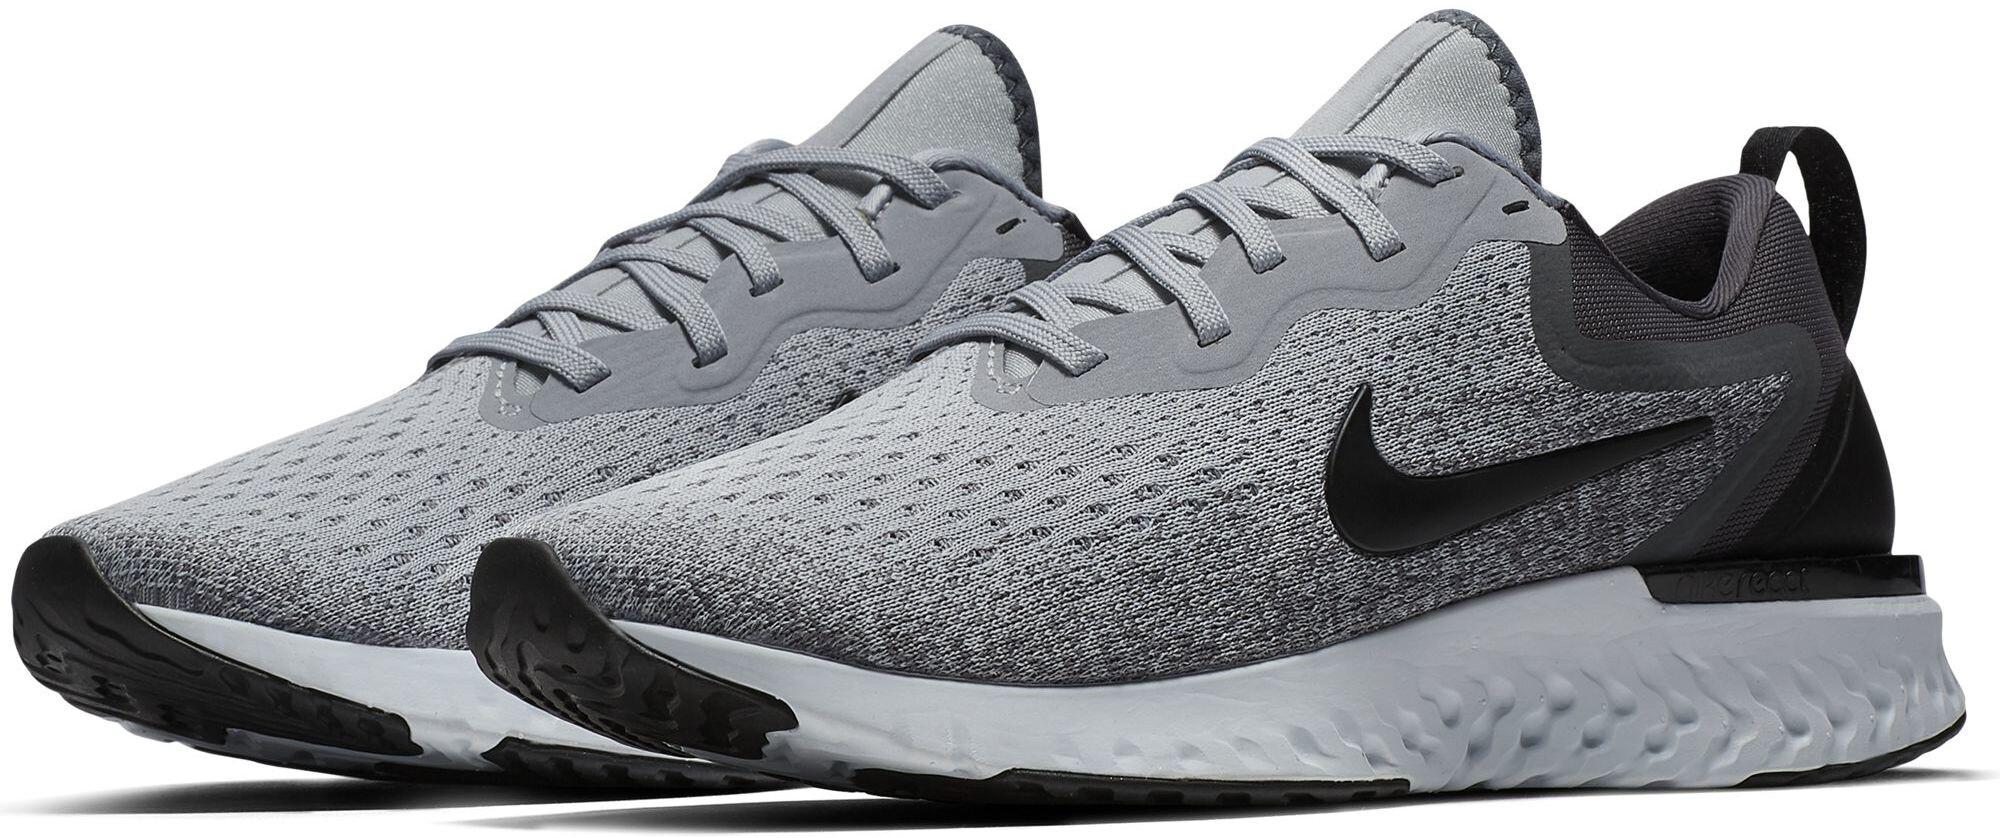 519ecc13 Nike Odyssey React Løpesko Dame wolf grey/black-dark grey-pure platinum